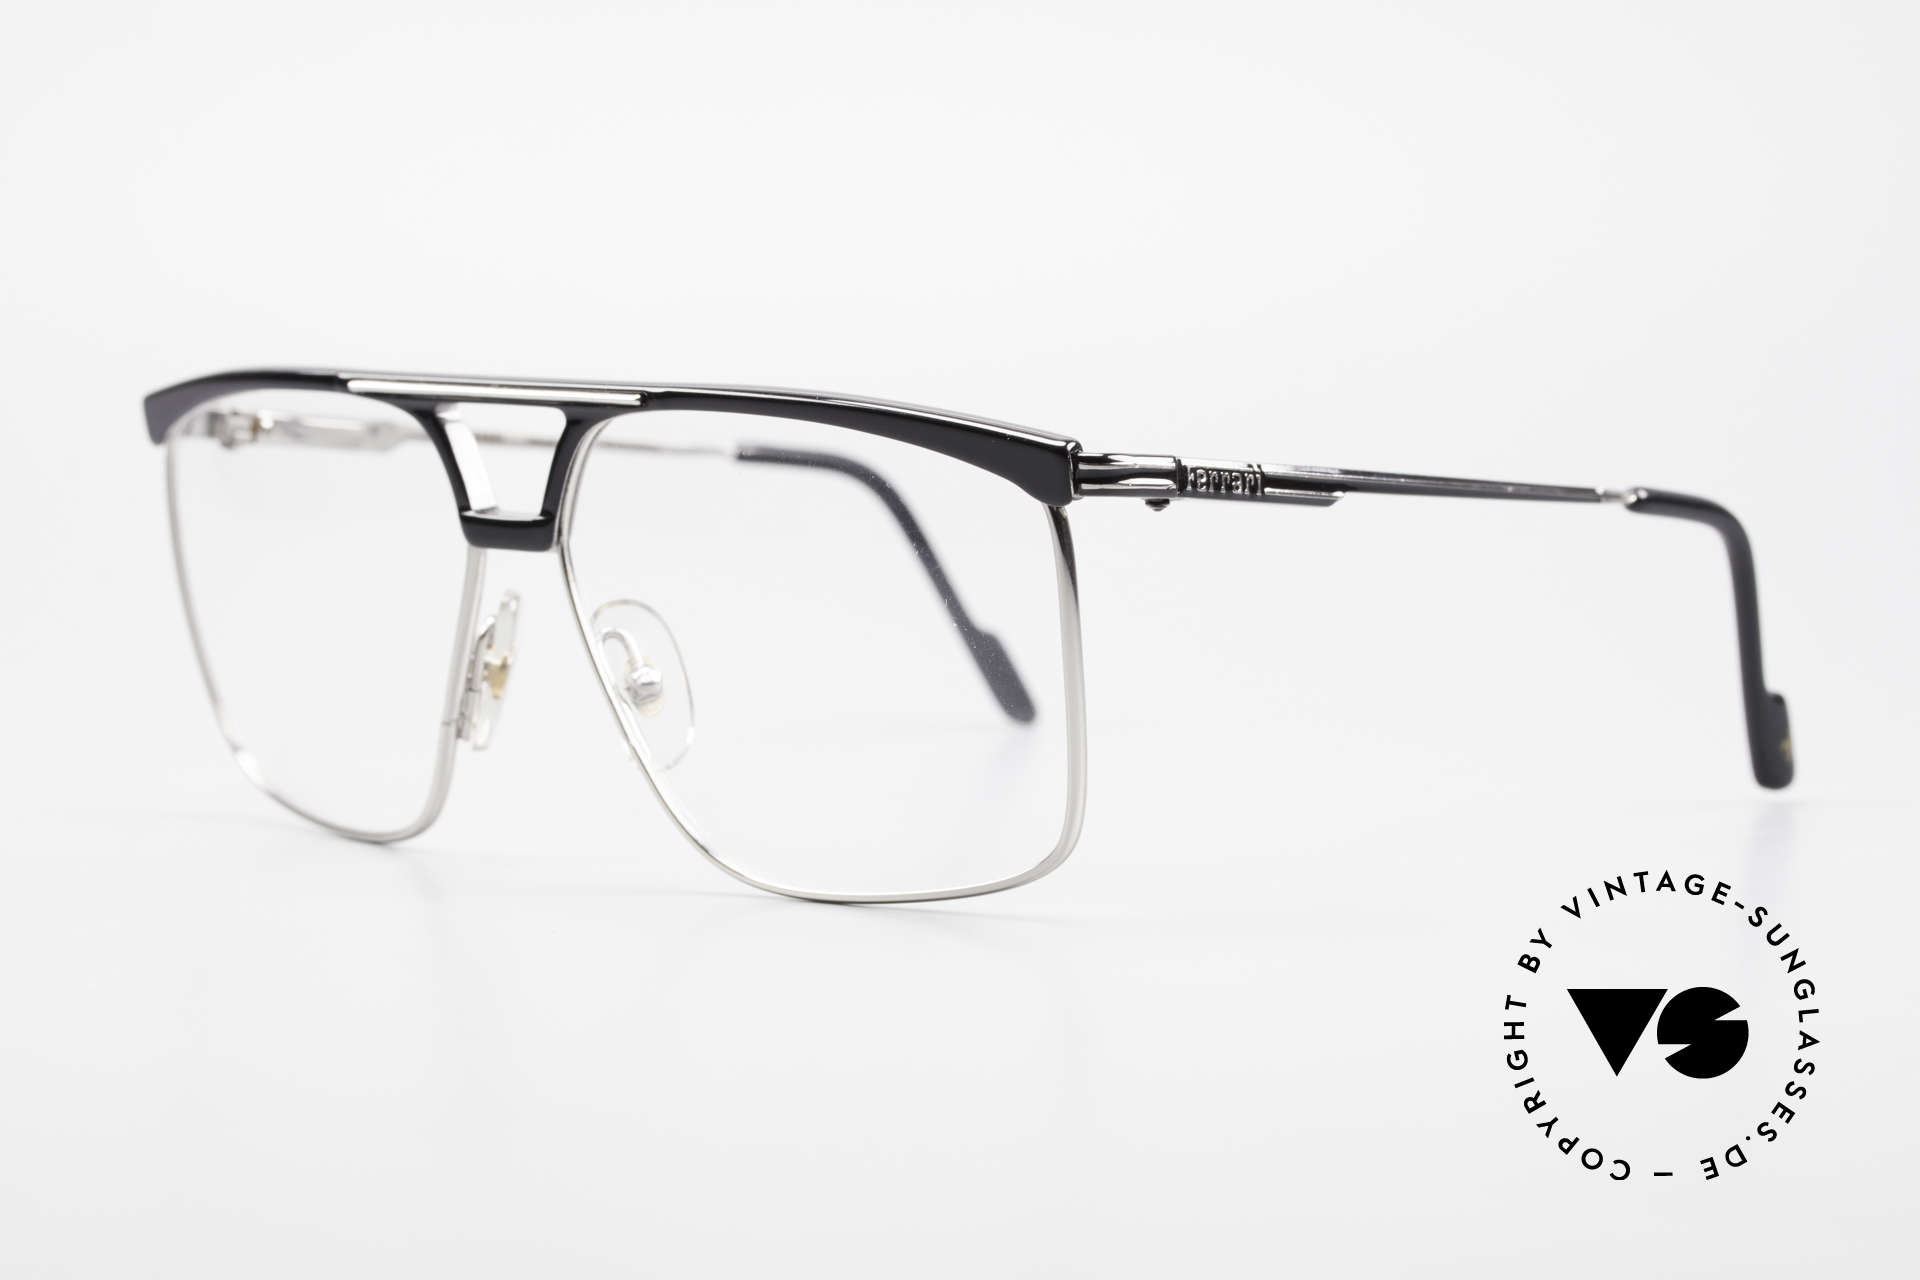 Ferrari F35 Large Vintage Men's Eyeglasses, high-end Alutanium frame with flexible spring hinges, Made for Men